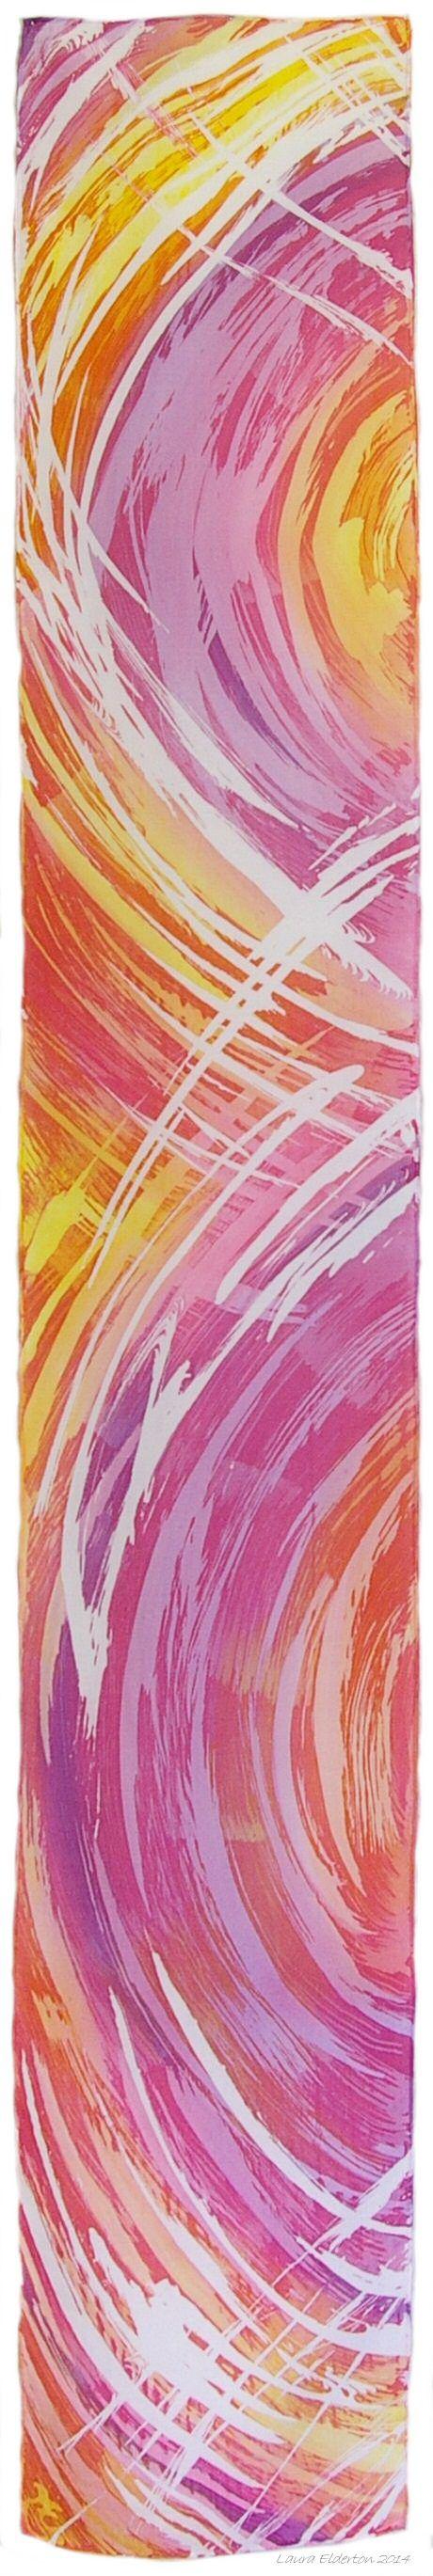 Sunset Colours hand dyed silk scarf by Laura Elderton www.etsy.com/shop/lauraelderton